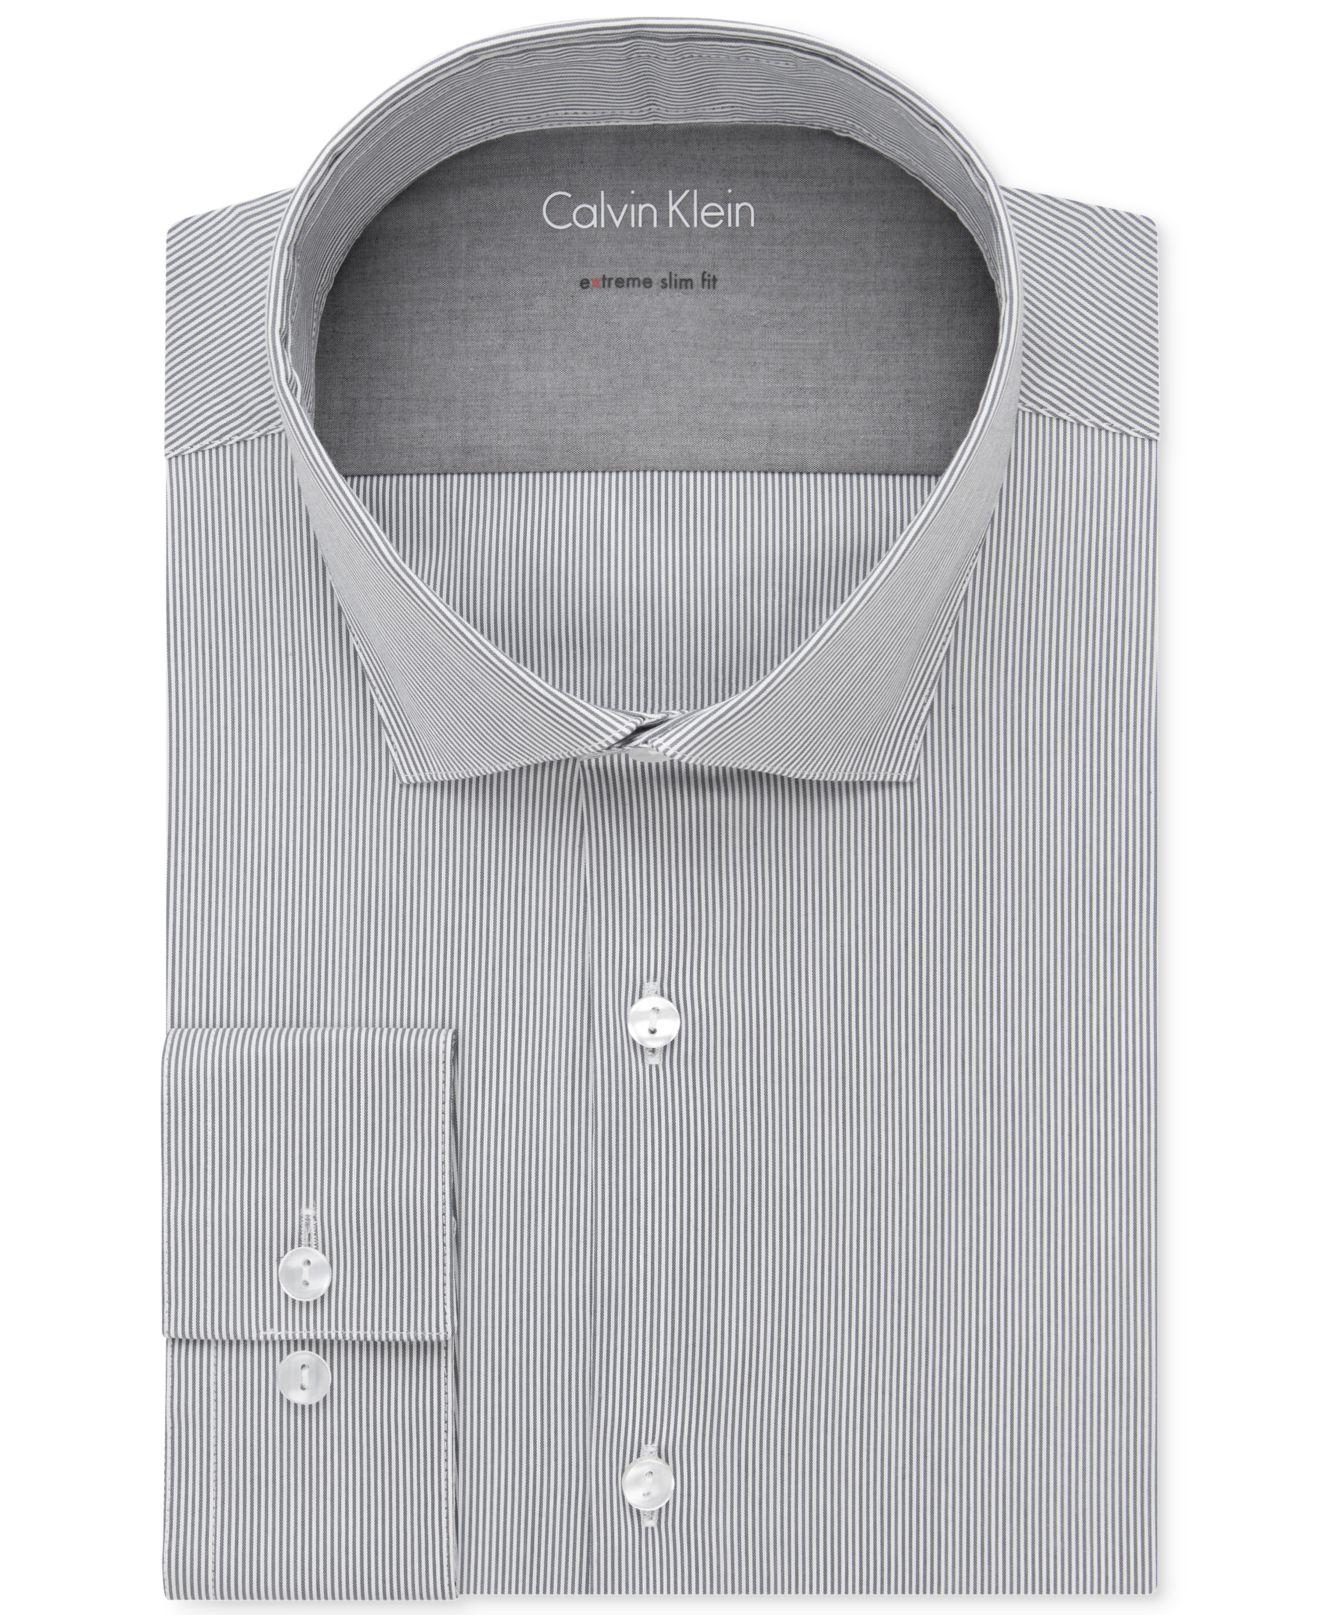 Lyst calvin klein x extra slim fit dove stripe dress for Calvin klein x fit dress shirt